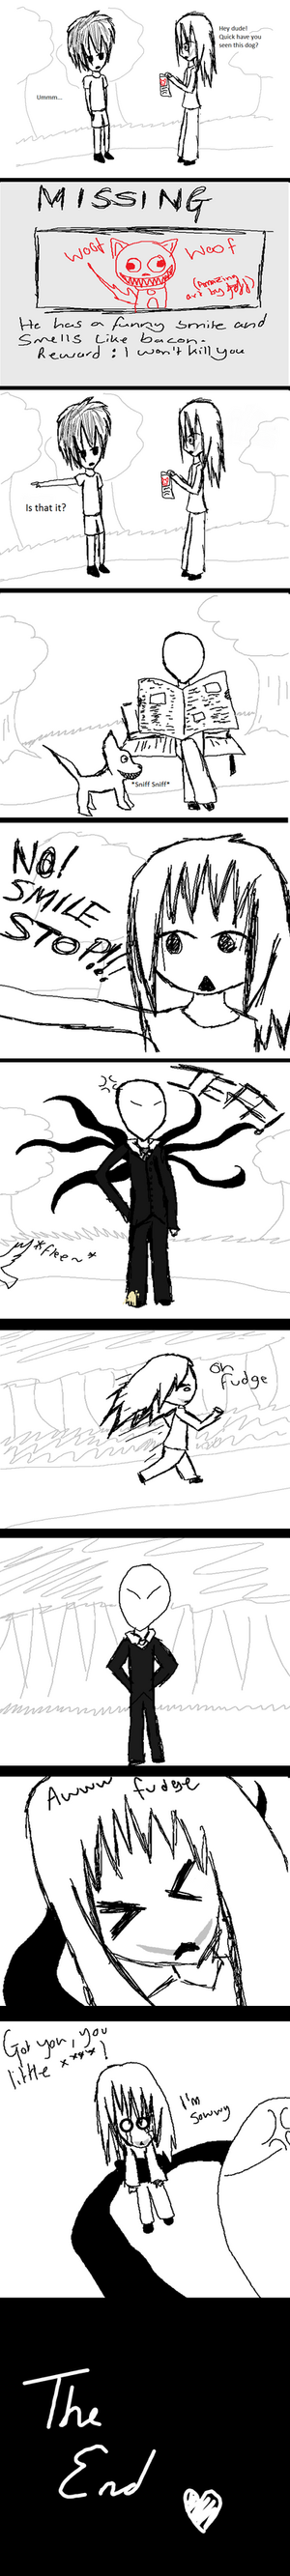 Comic by MelancholyHorror